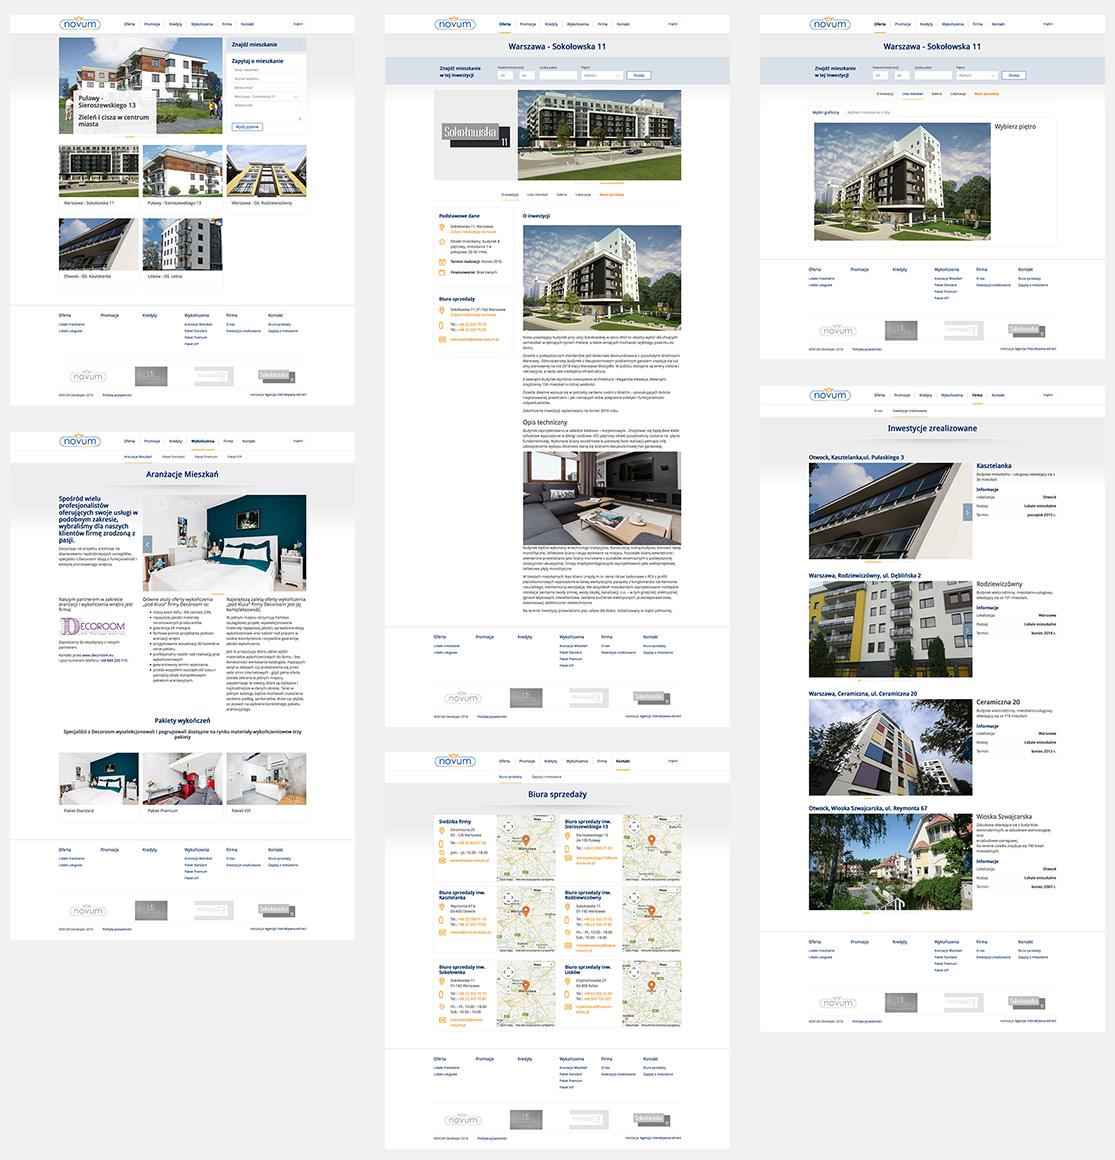 NOVUM Developer - strona wizerunkowa CMS Drupal